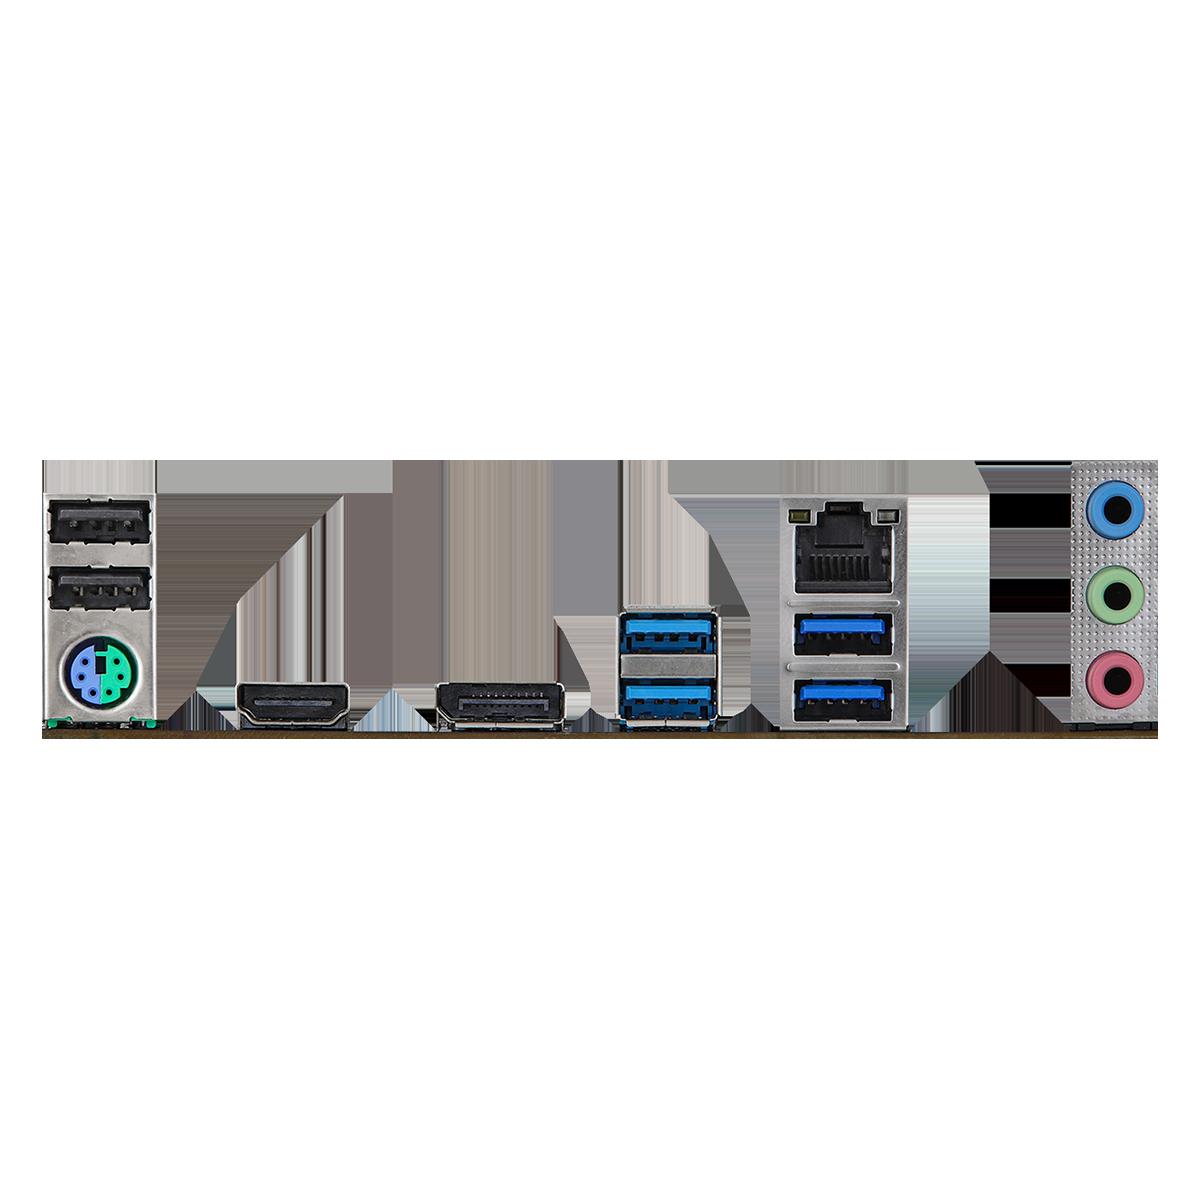 Placa Mãe ASRock Z590M Pro4, Chipset Intel Z590, Socket 1200, mATX, DDR4